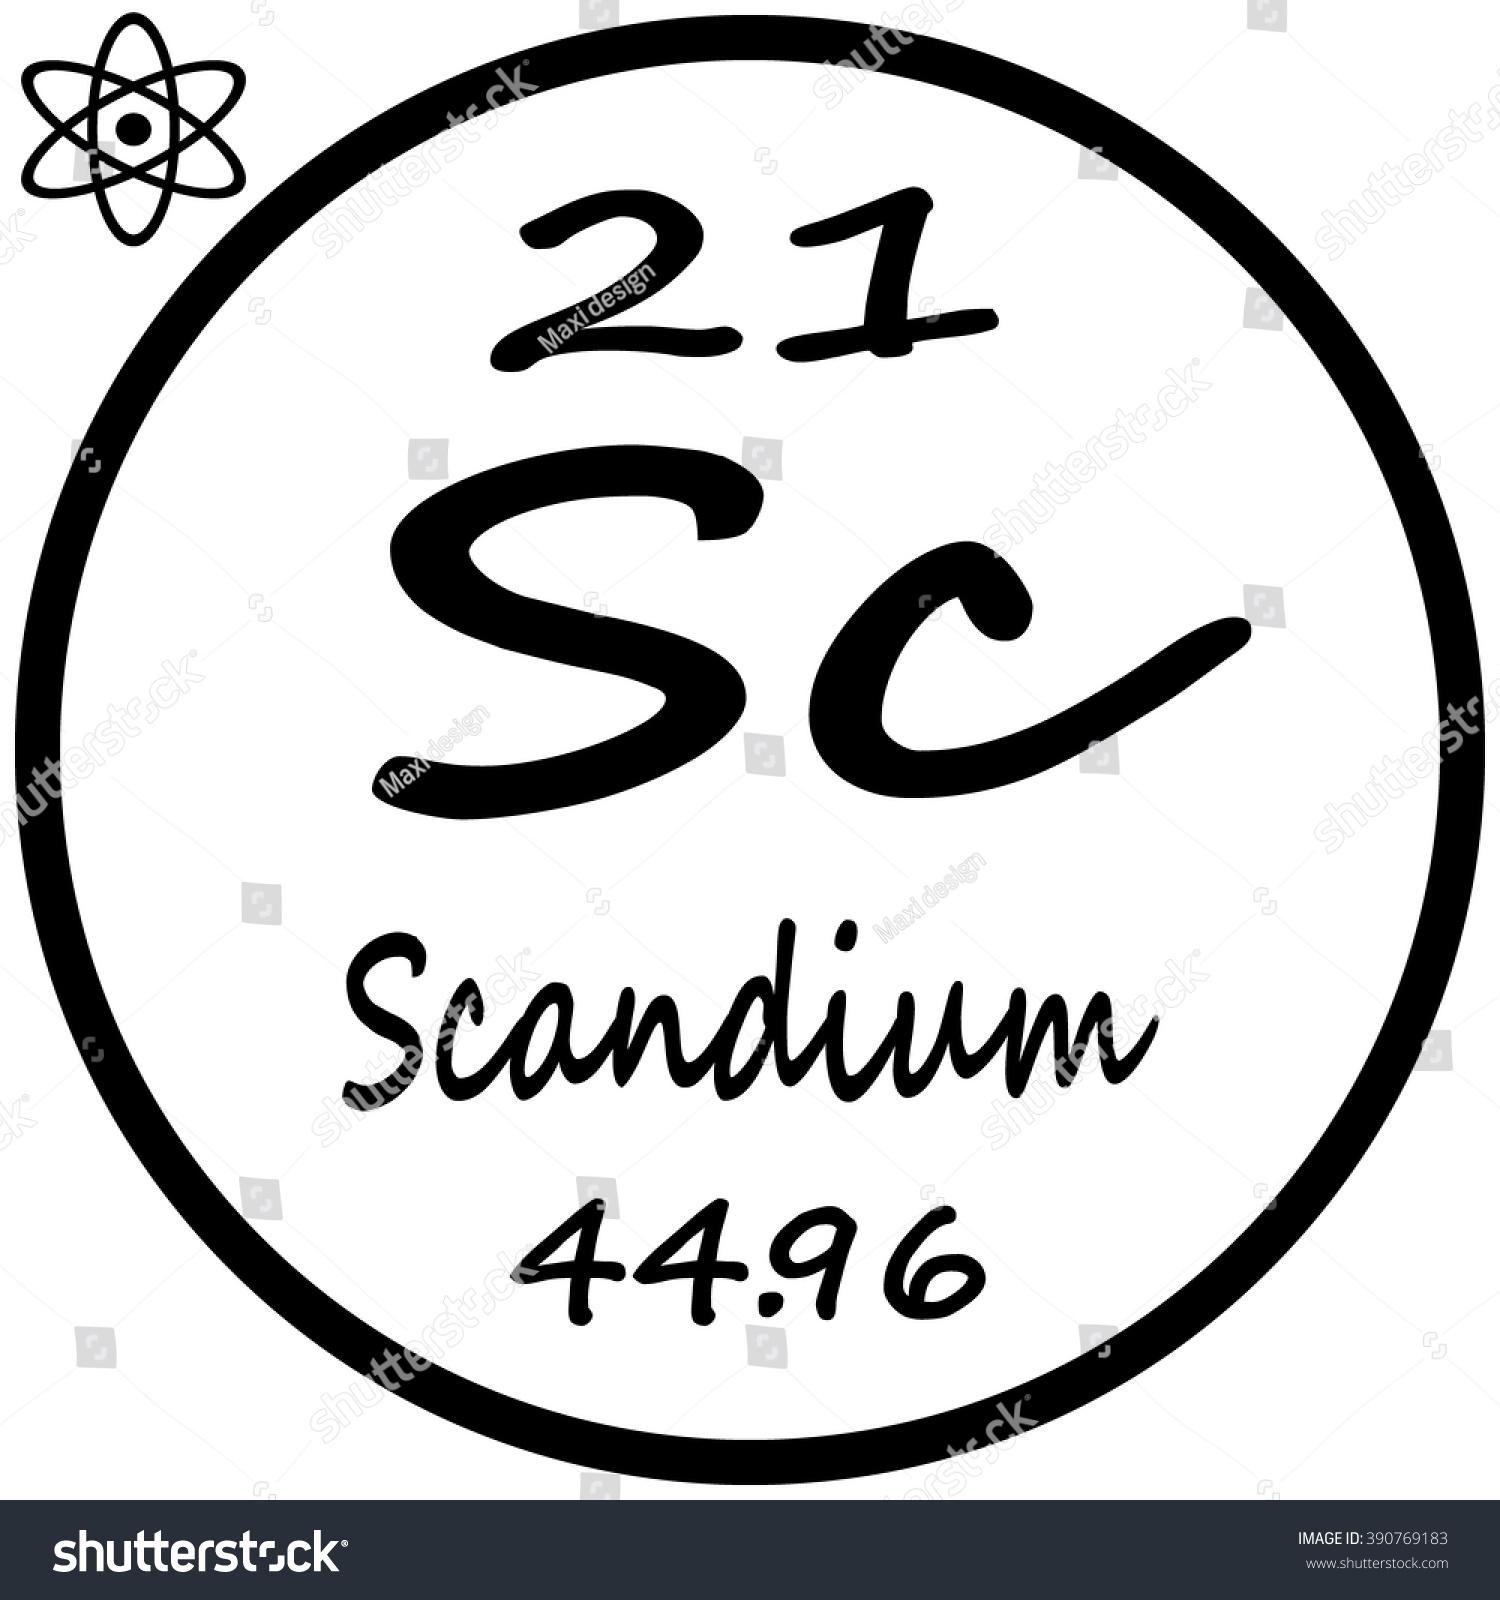 Periodic table elements scandium stock vector 390769183 shutterstock periodic table of elements scandium gamestrikefo Images